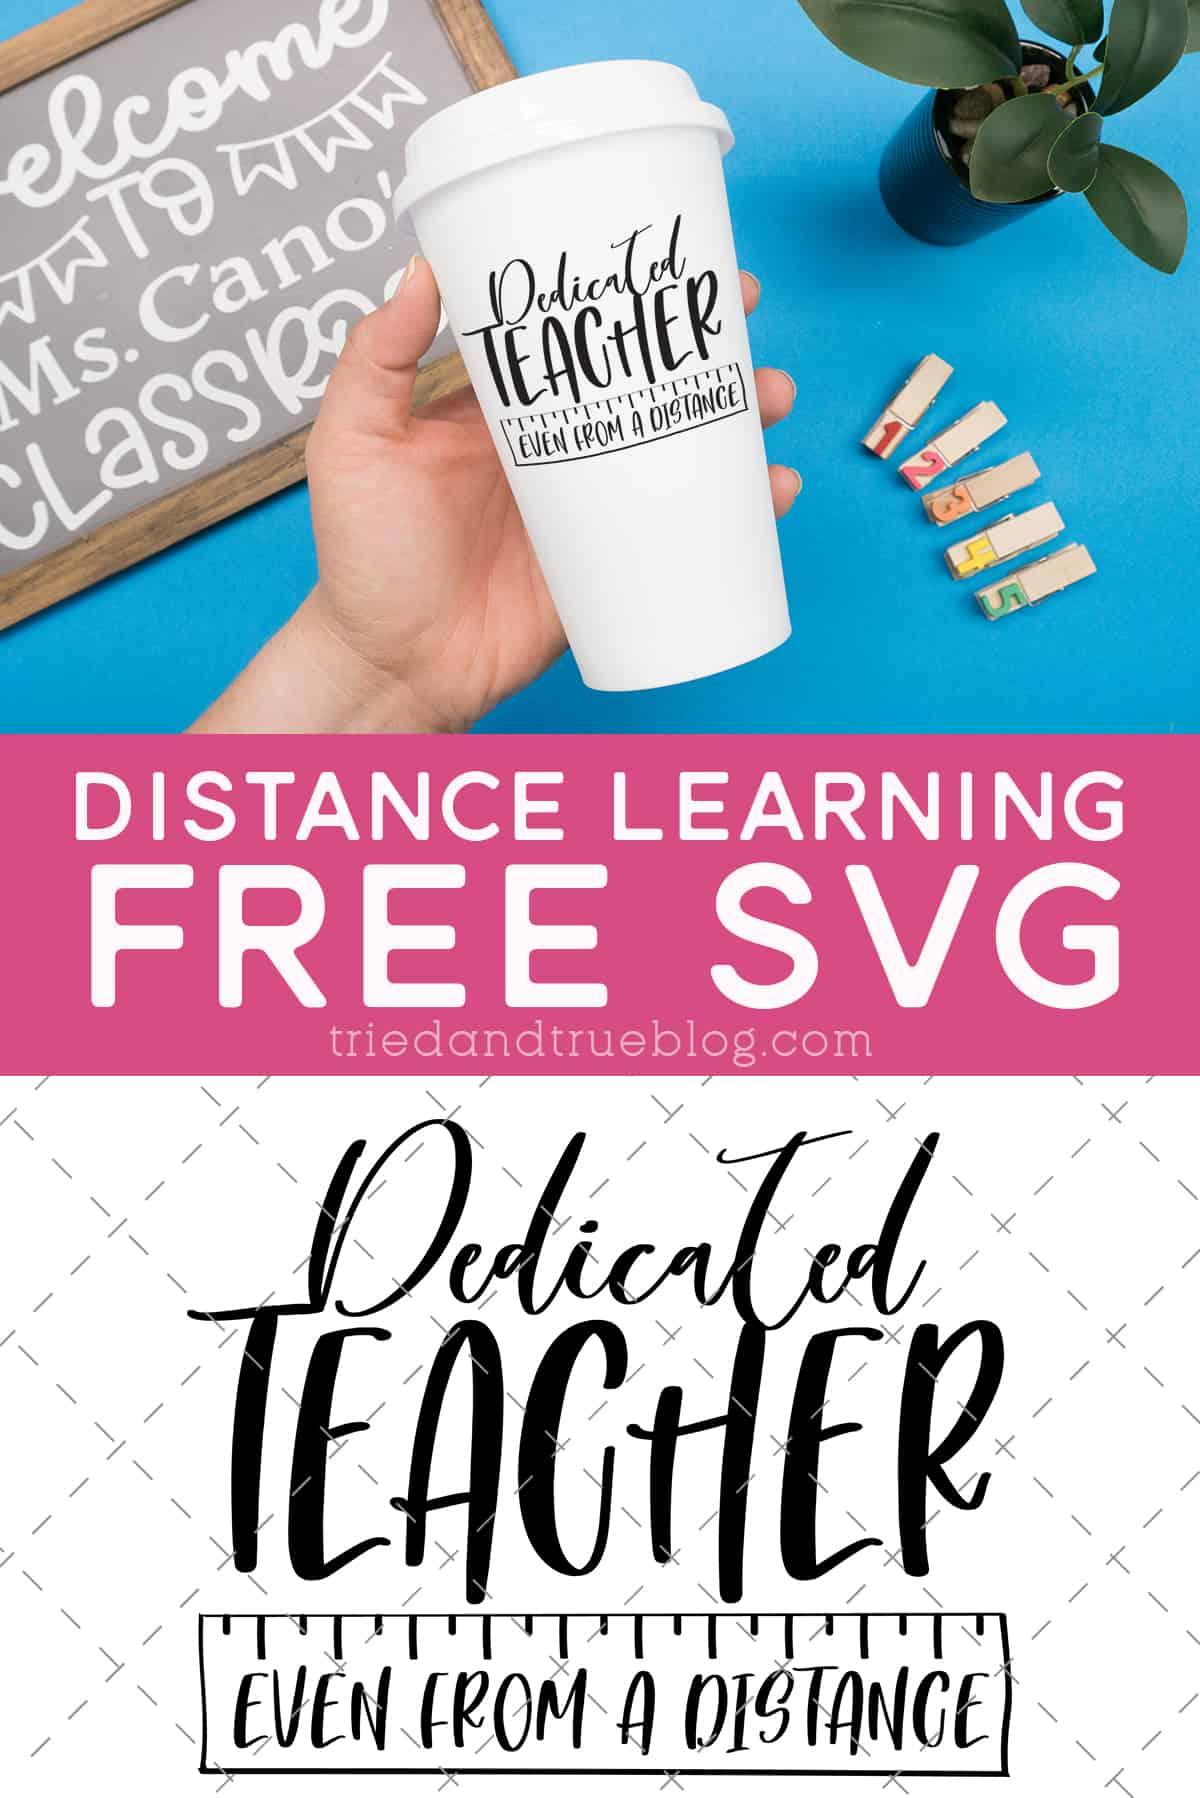 Dedicated Distance Learning Teacher-EDIT04